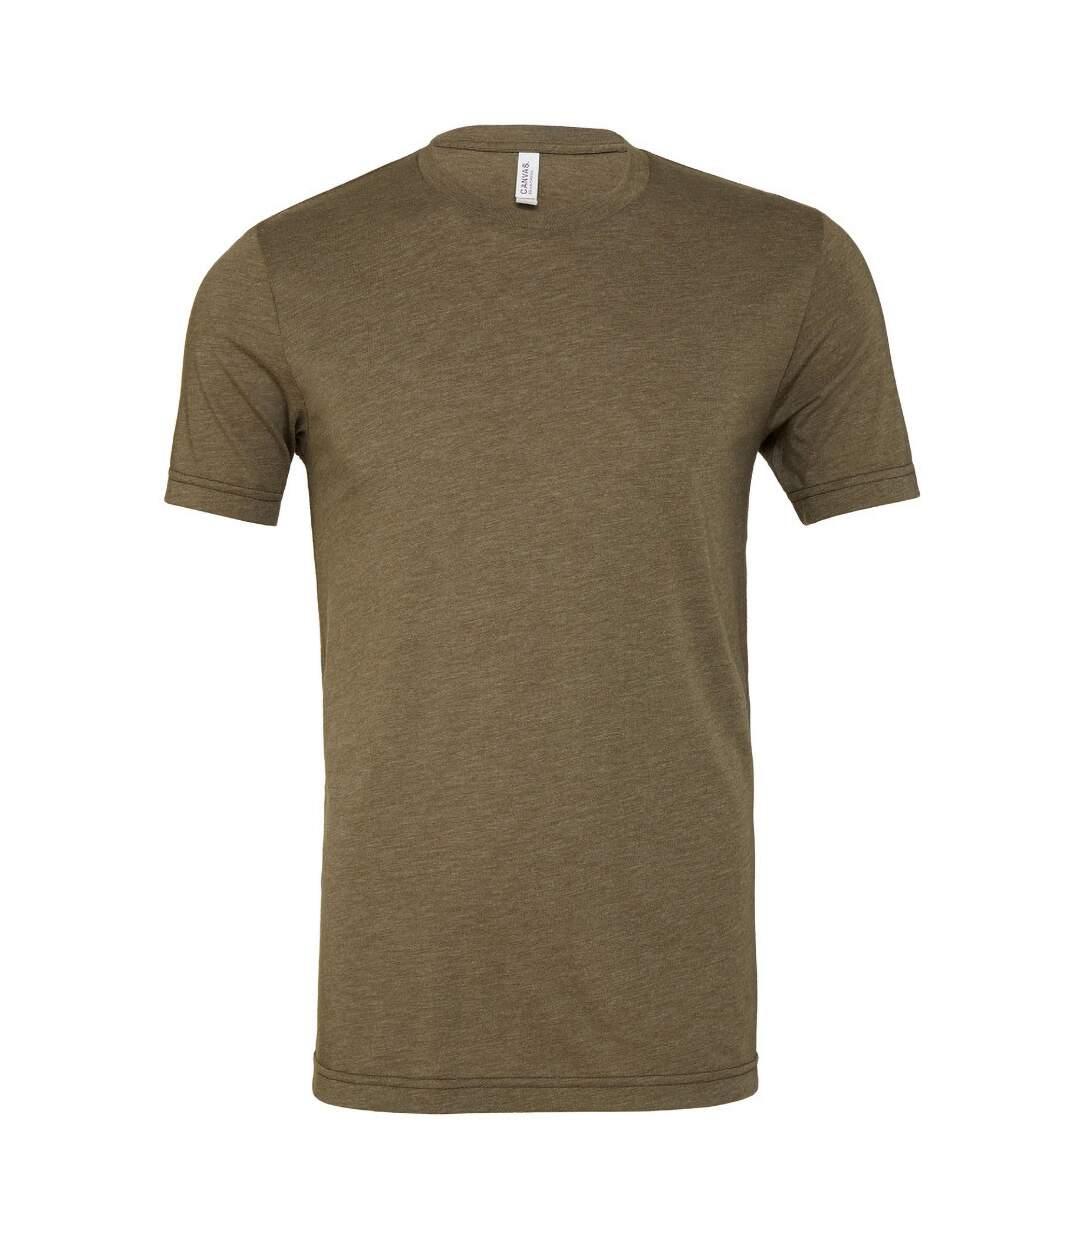 Canvas Mens Triblend Crew Neck Plain Short Sleeve T-Shirt (Olive Triblend) - UTBC2596